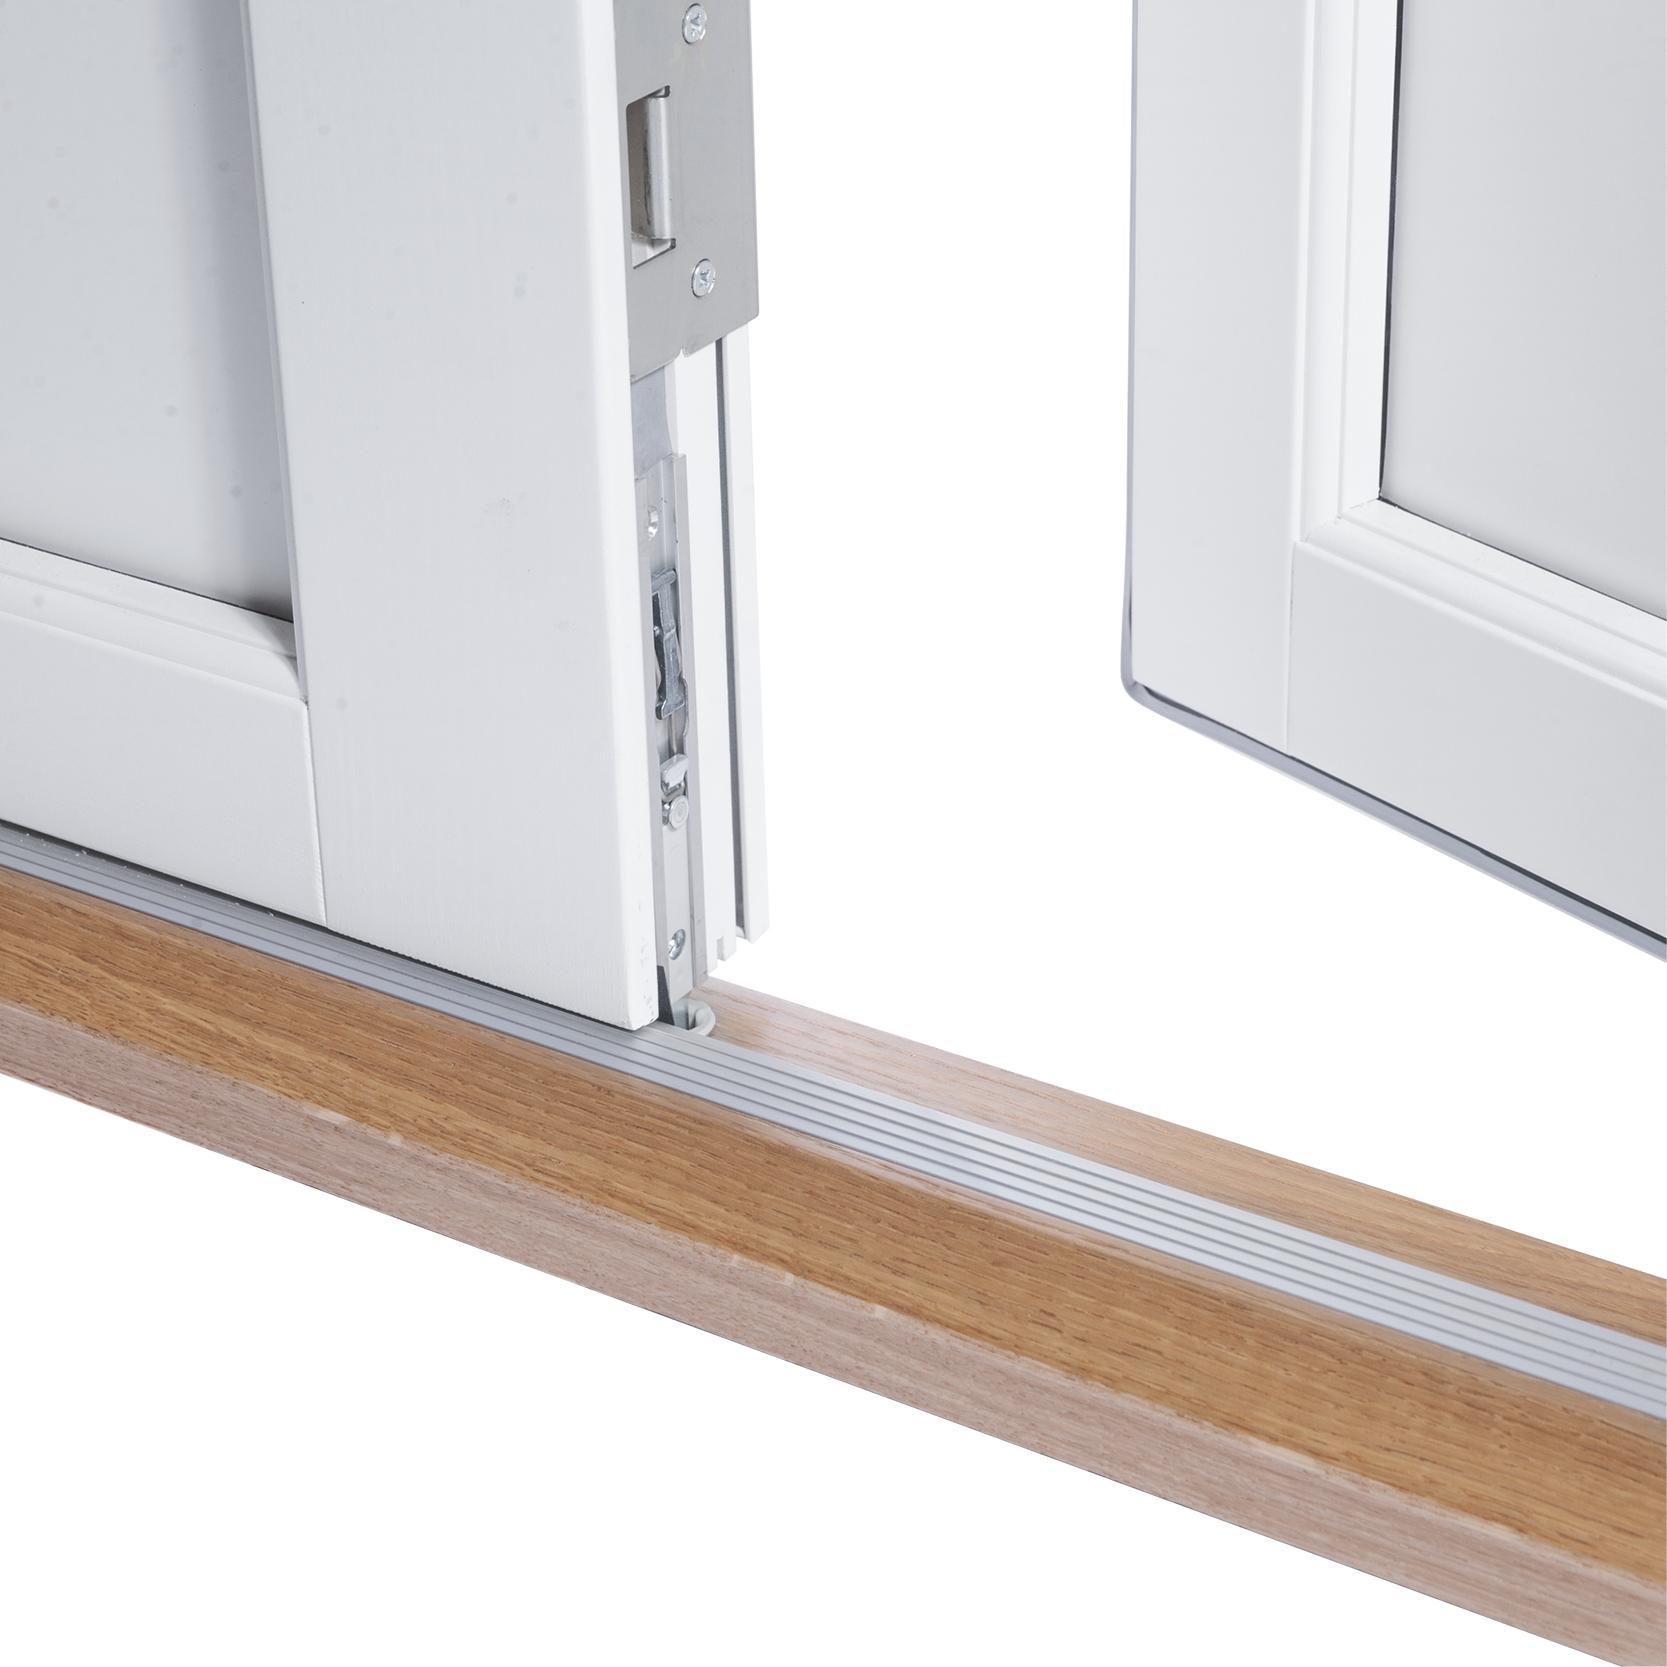 Par Altan/Balkongdörr 2 Glas – Trä – Flex Fönster